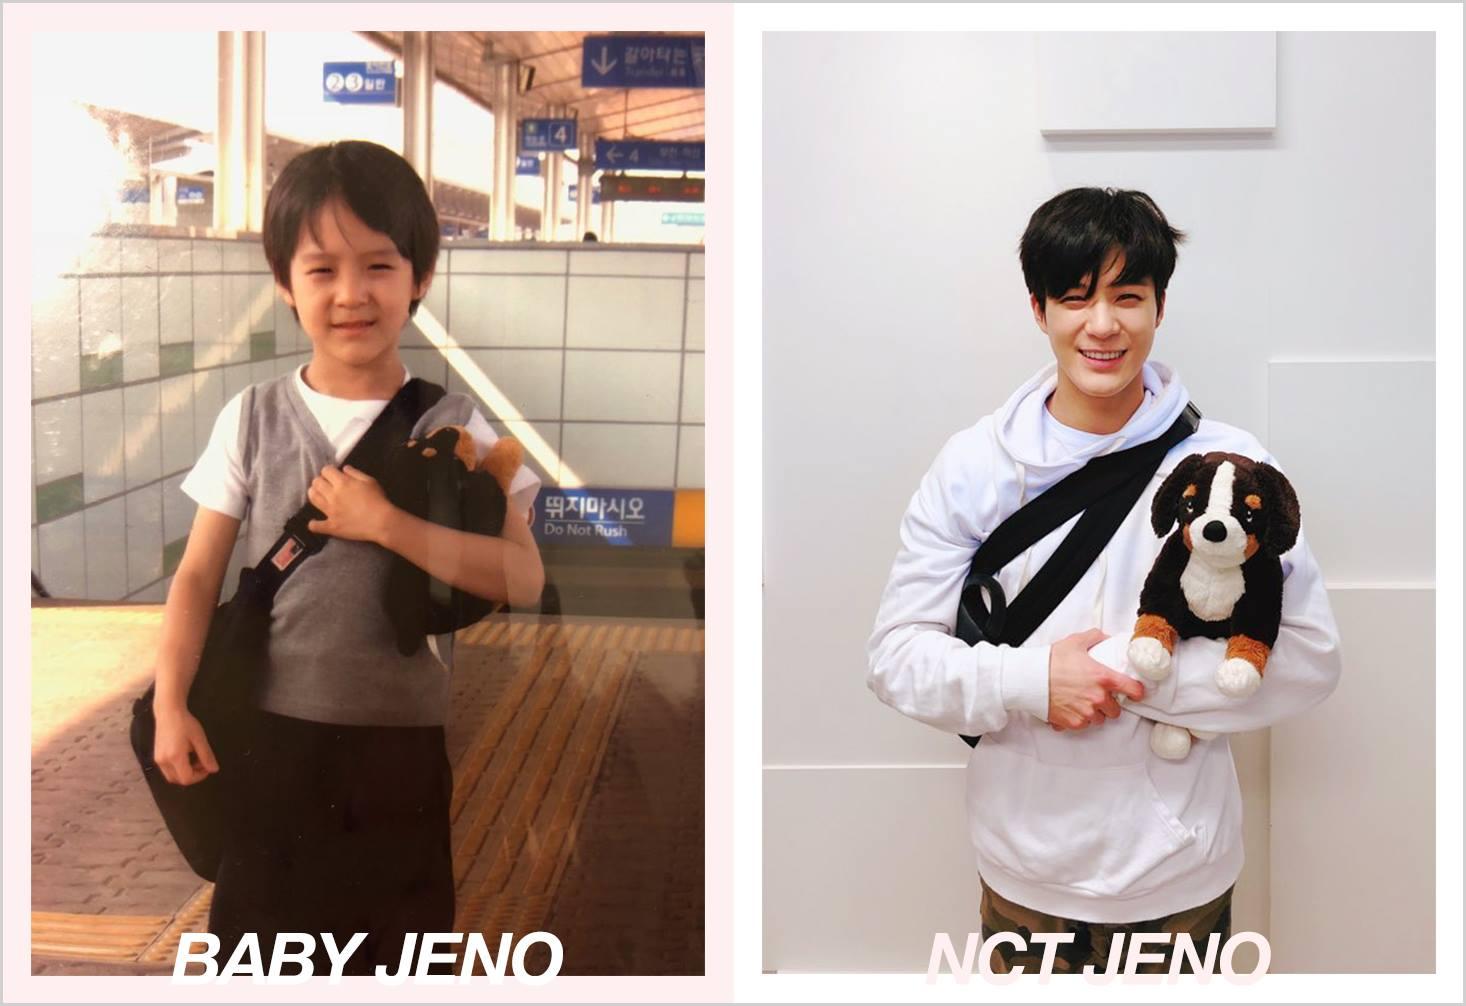 TOP 4 NCT - Jeno